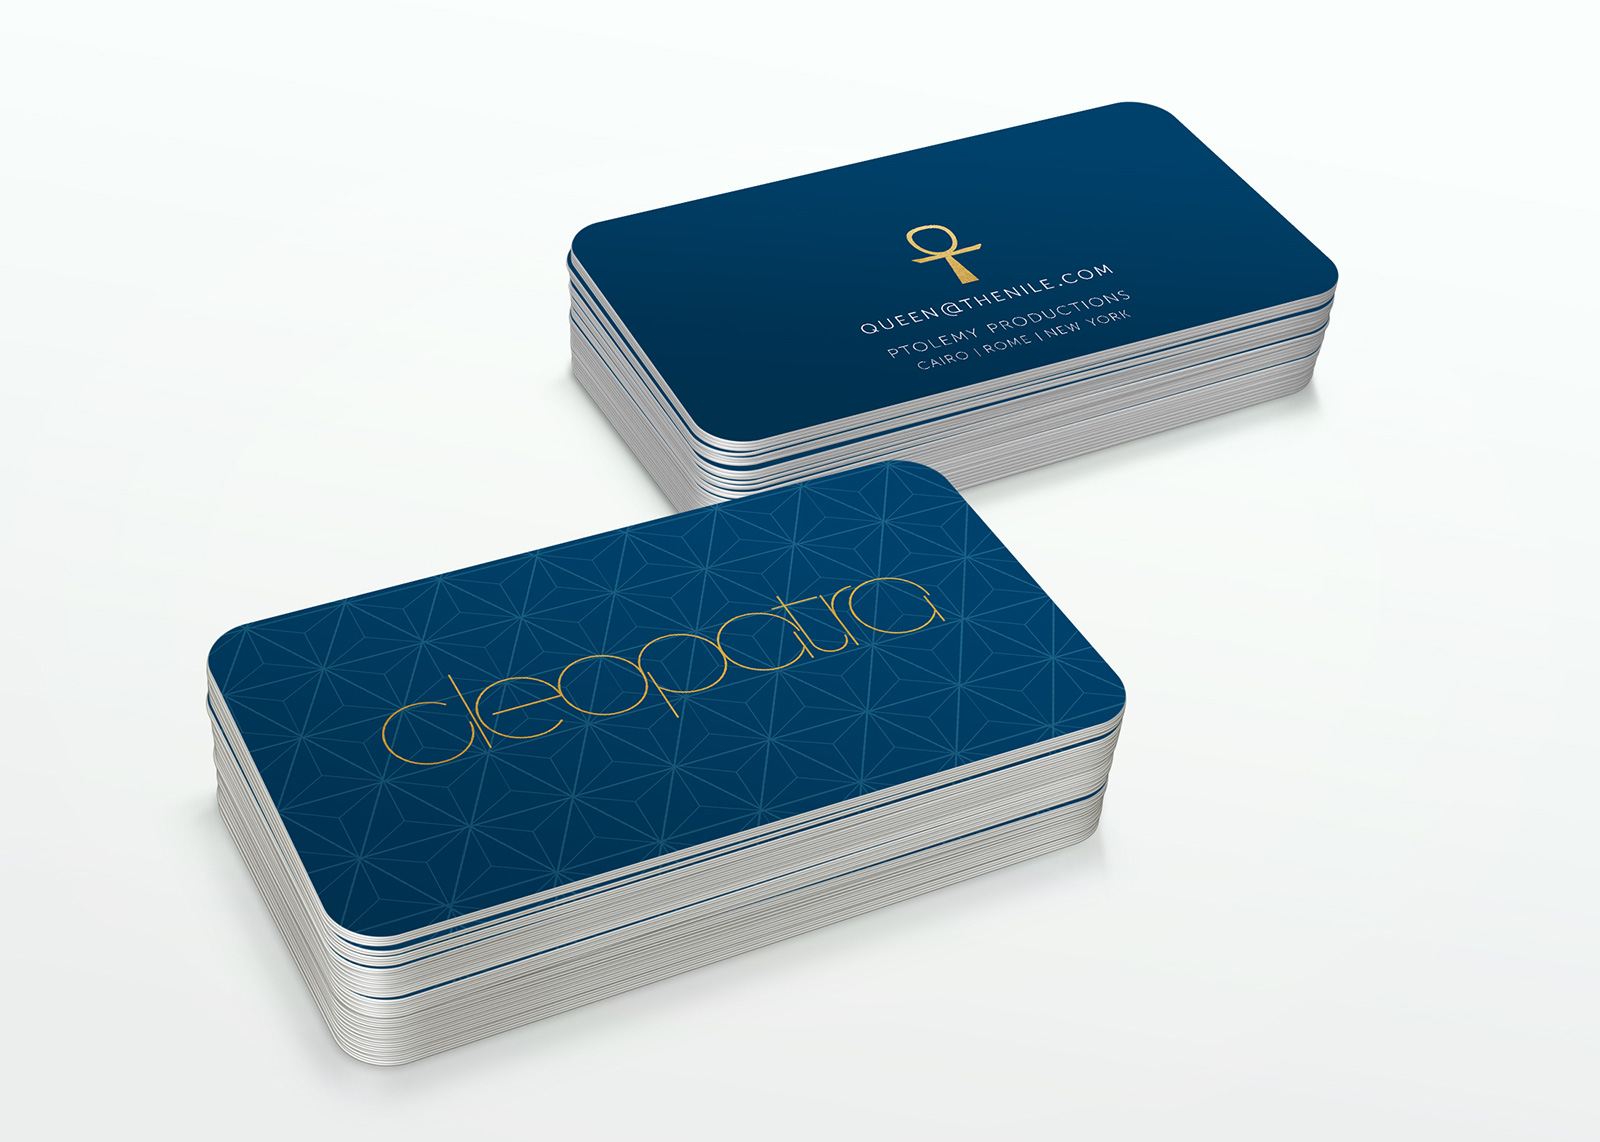 cleopatra brand identity business cards